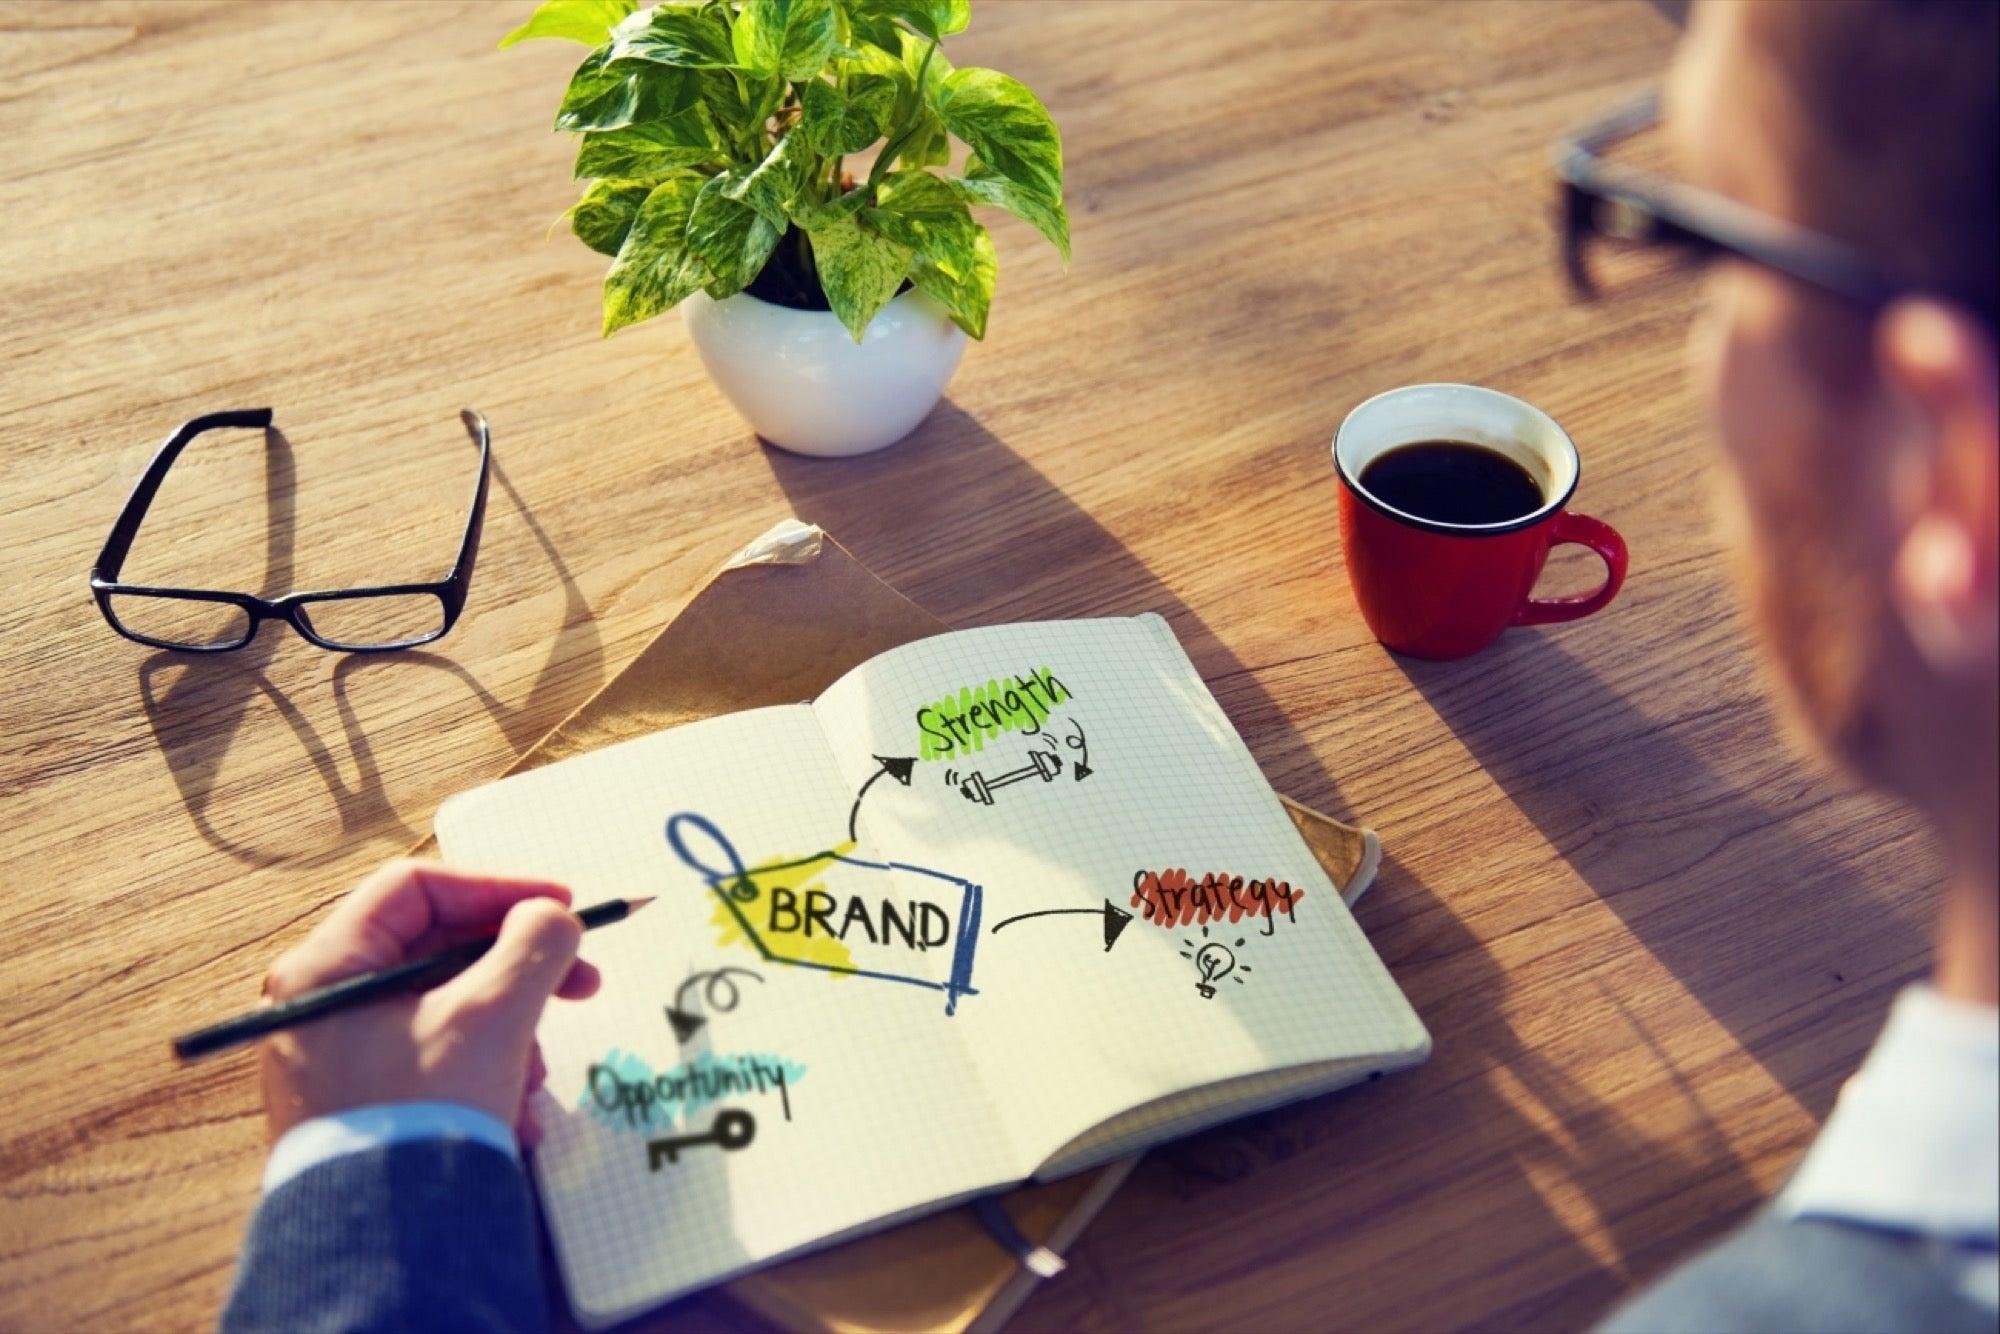 10 Important Tips for Entrepreneurs to Improve Personal Branding